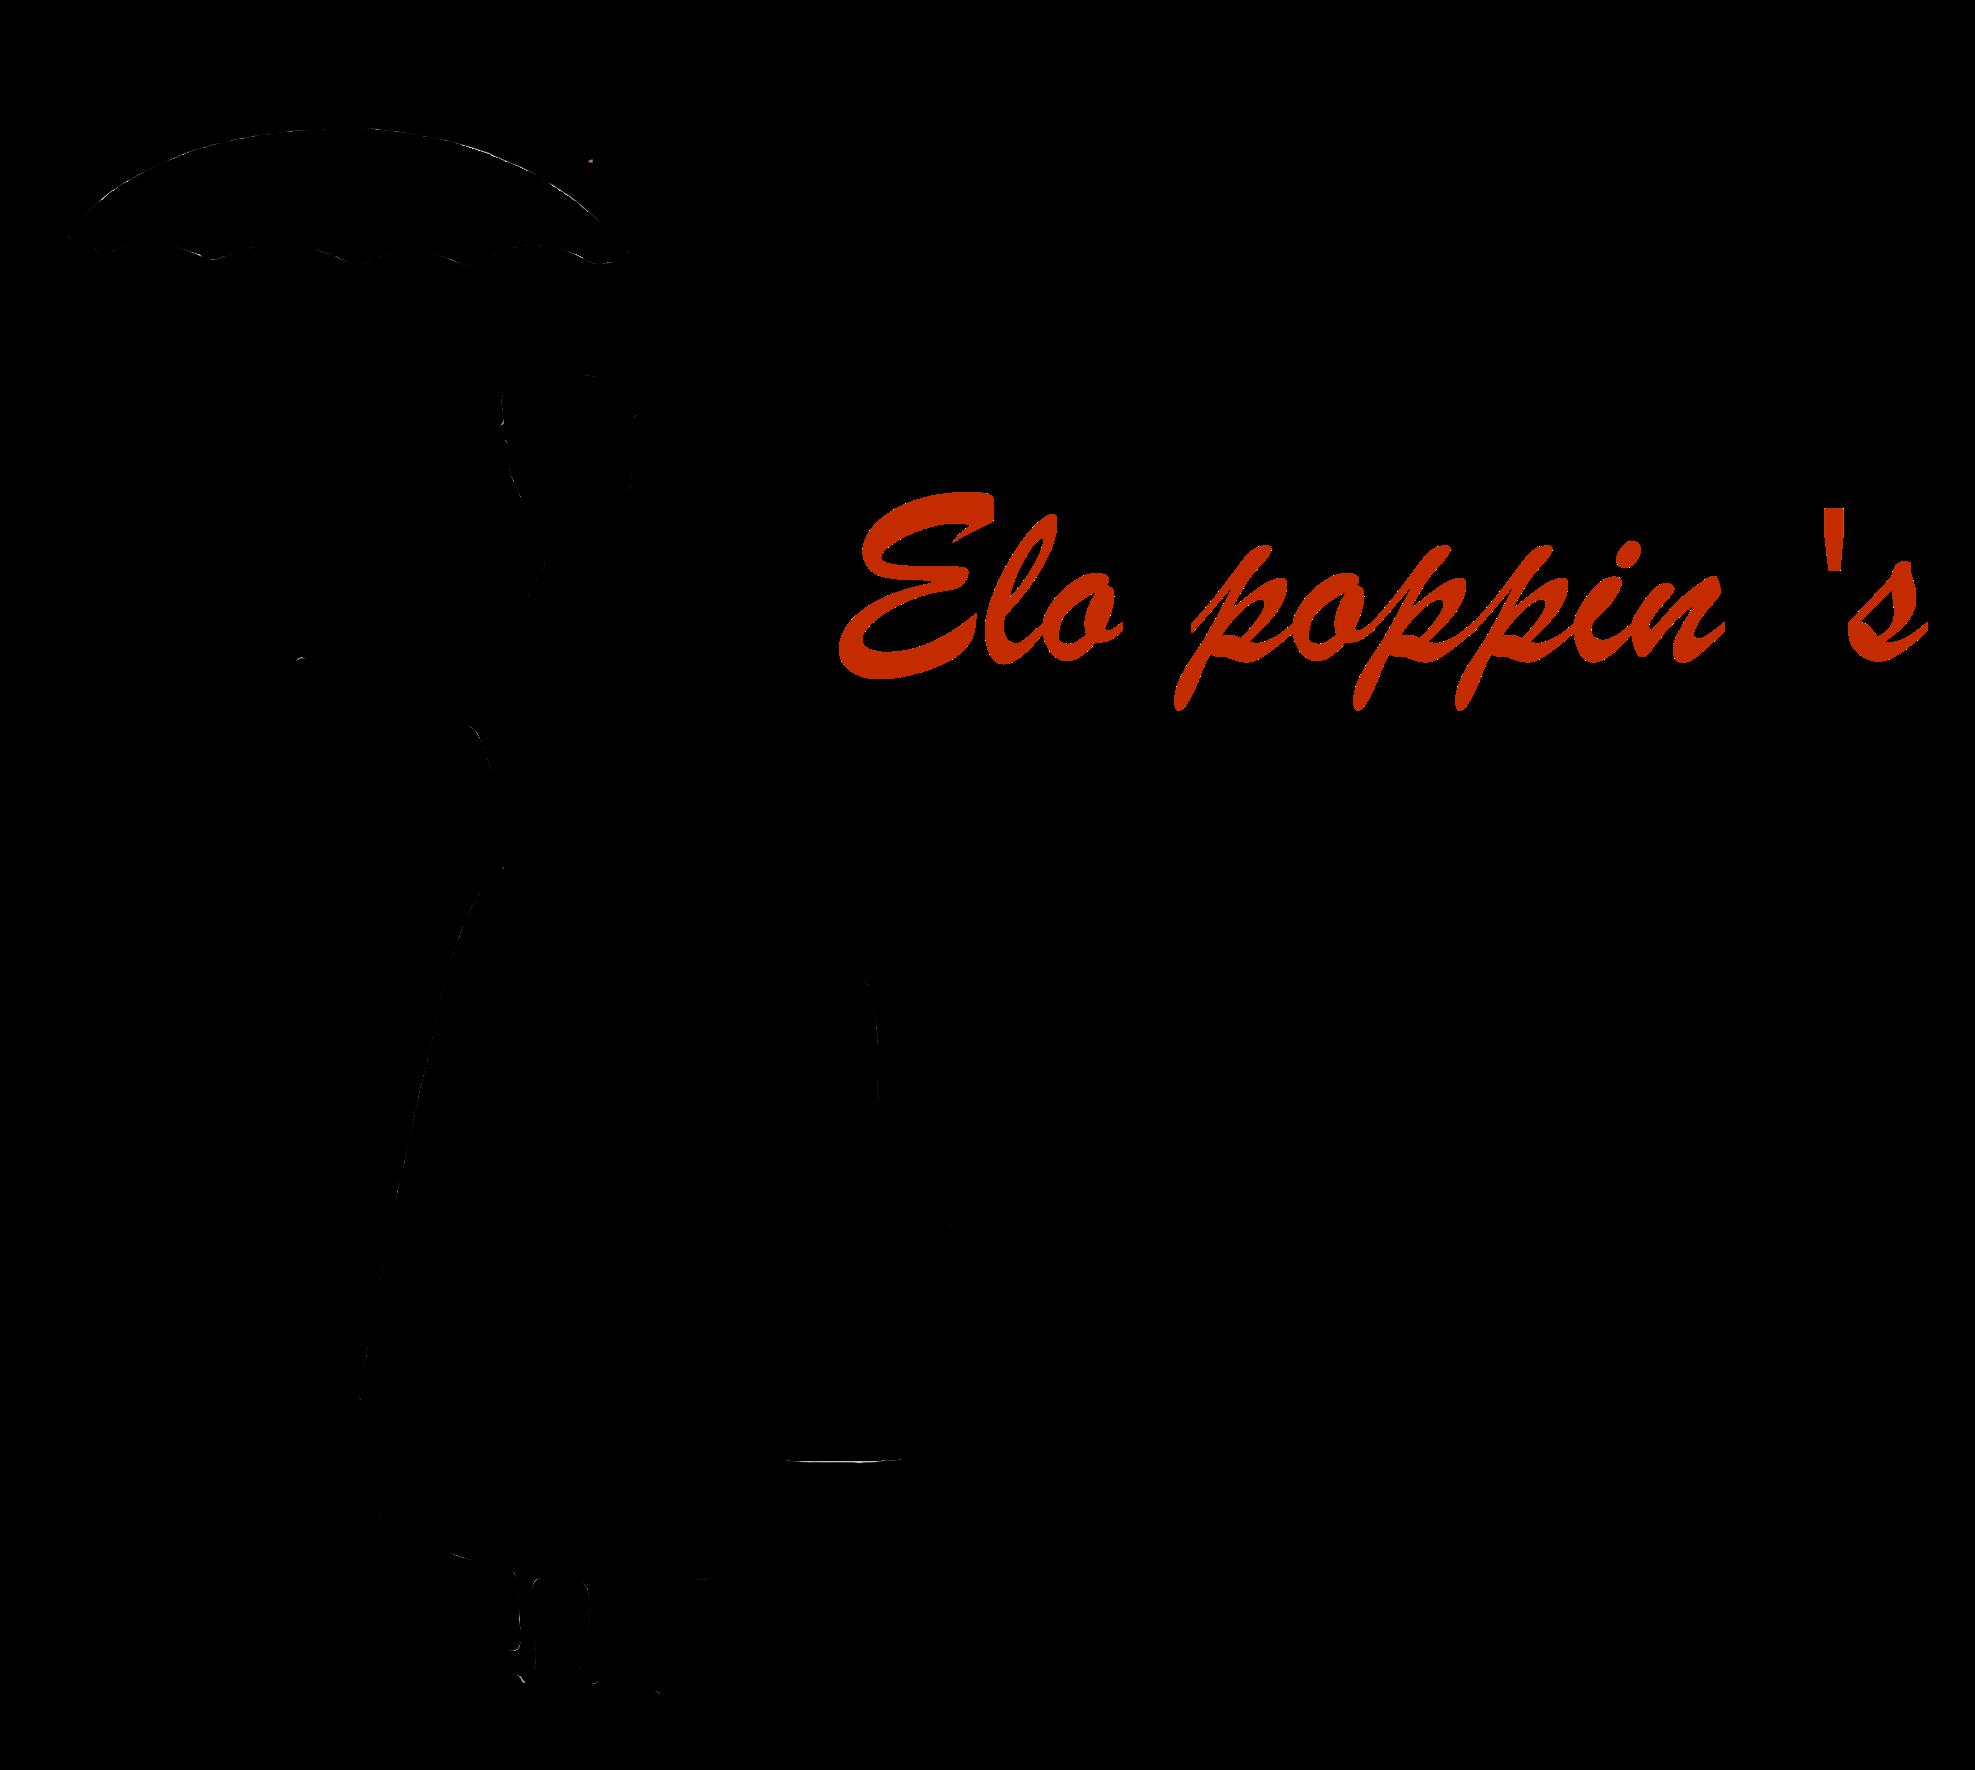 Elo poppin's